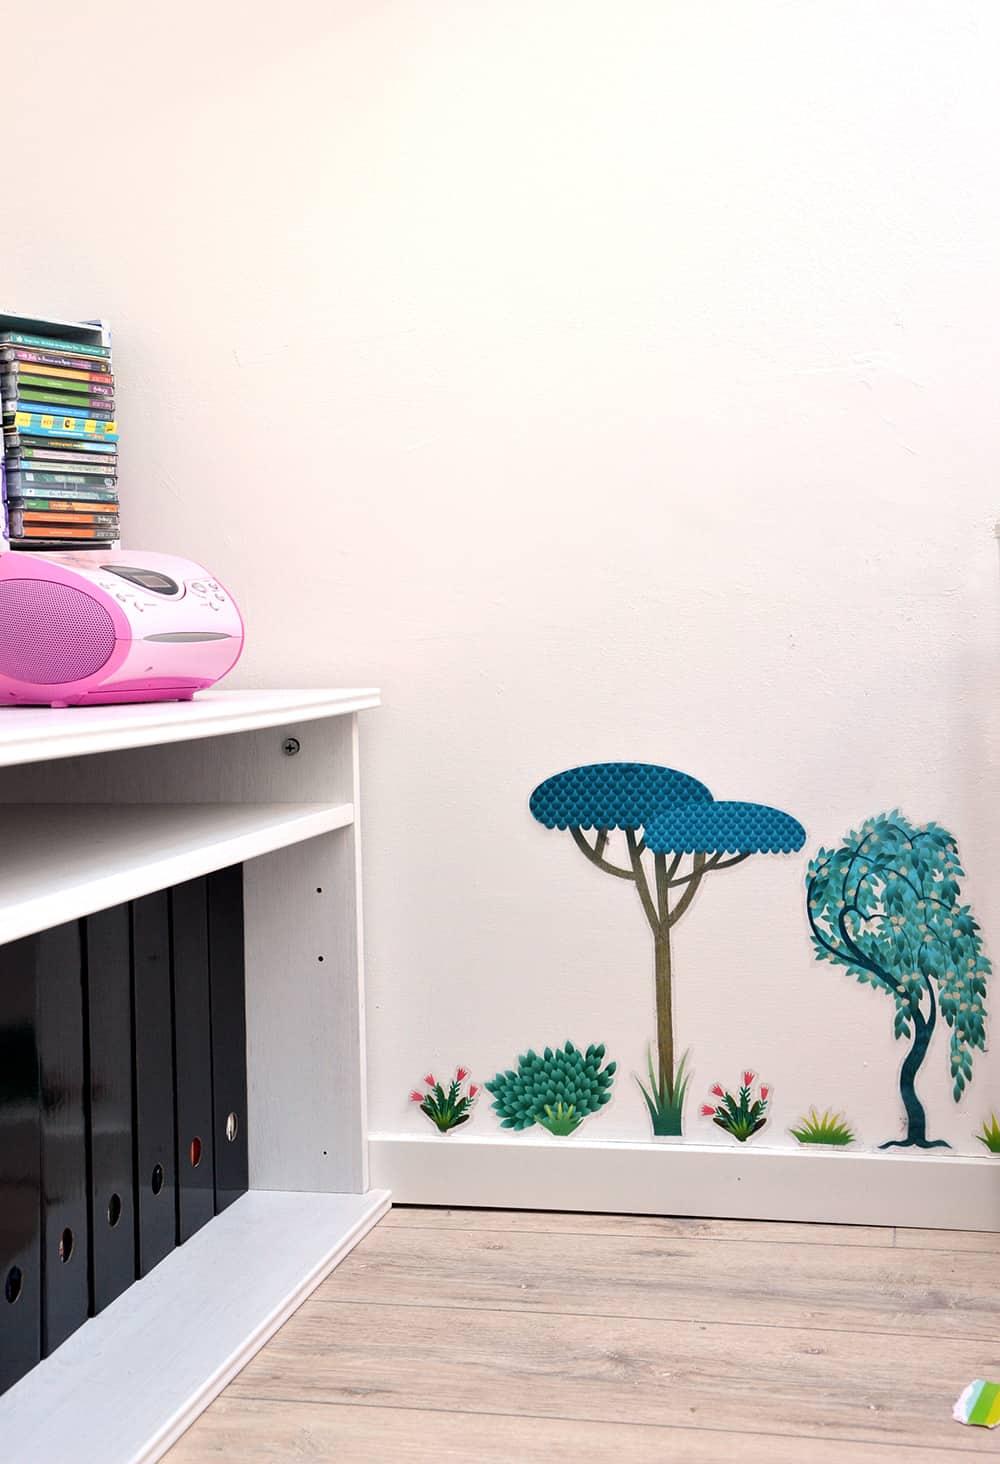 Kinderzimmer-Umbau, Renovierungsideen - Erbsenprinzessin Blog